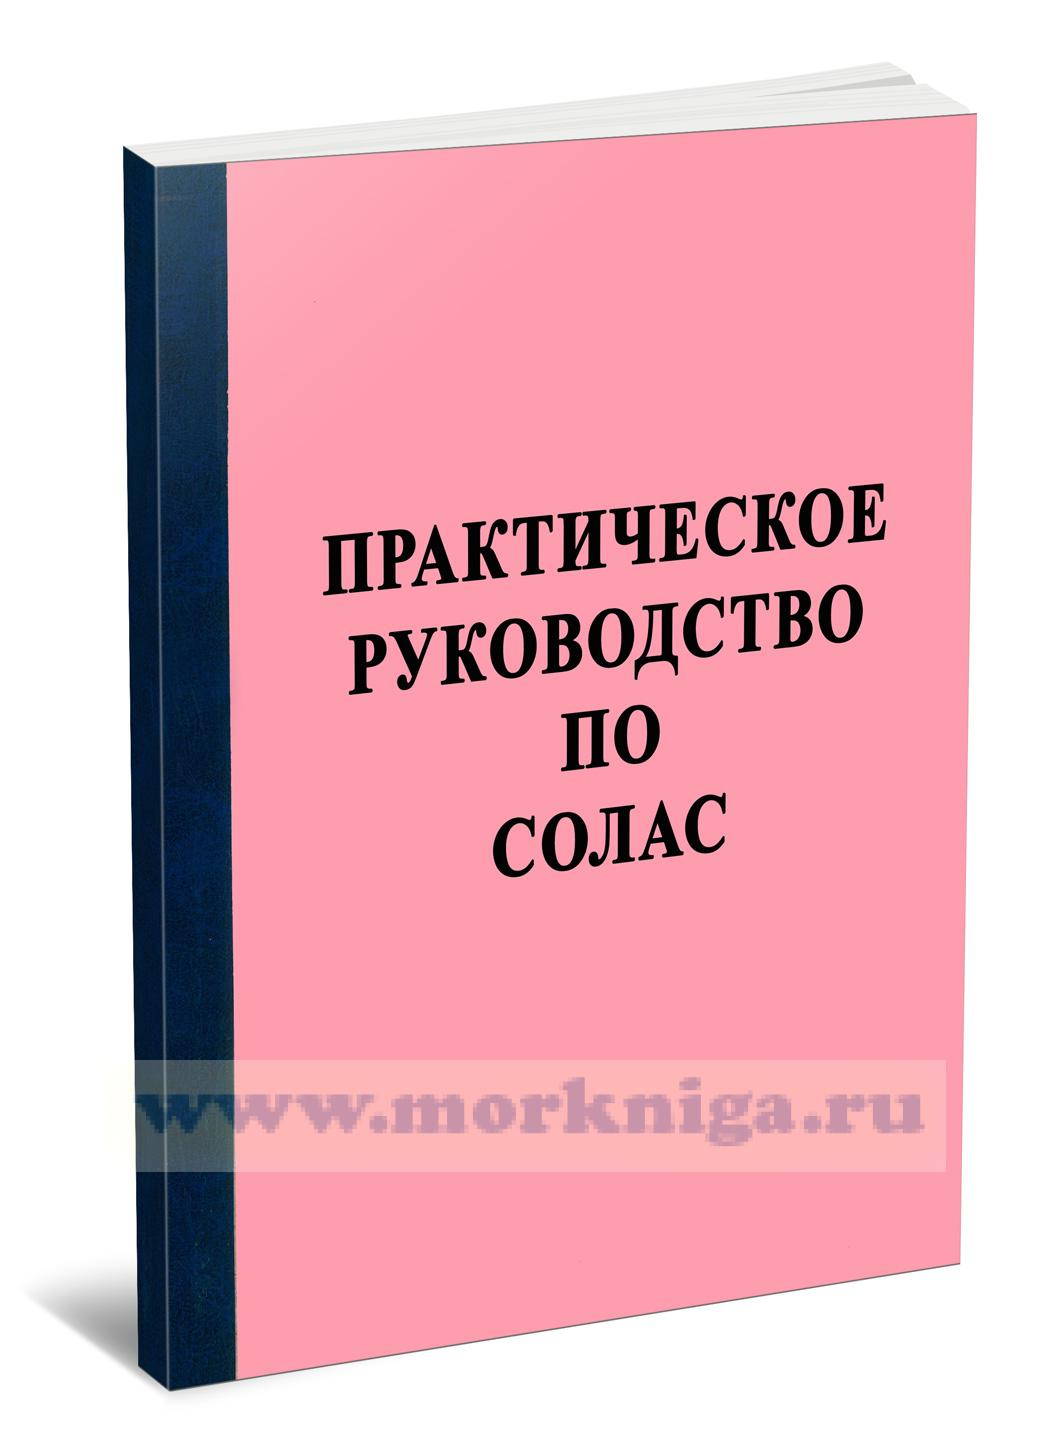 Практическое руководство по СОЛАС. Health, Safety and Training (Russian Version)